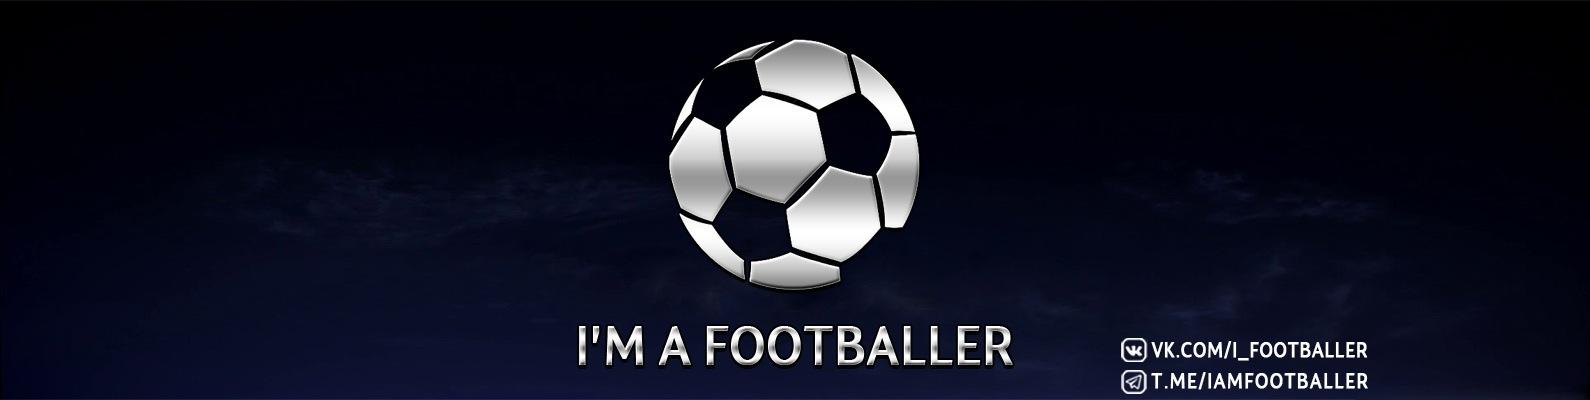 ювентус реал ставки футбол мадрид